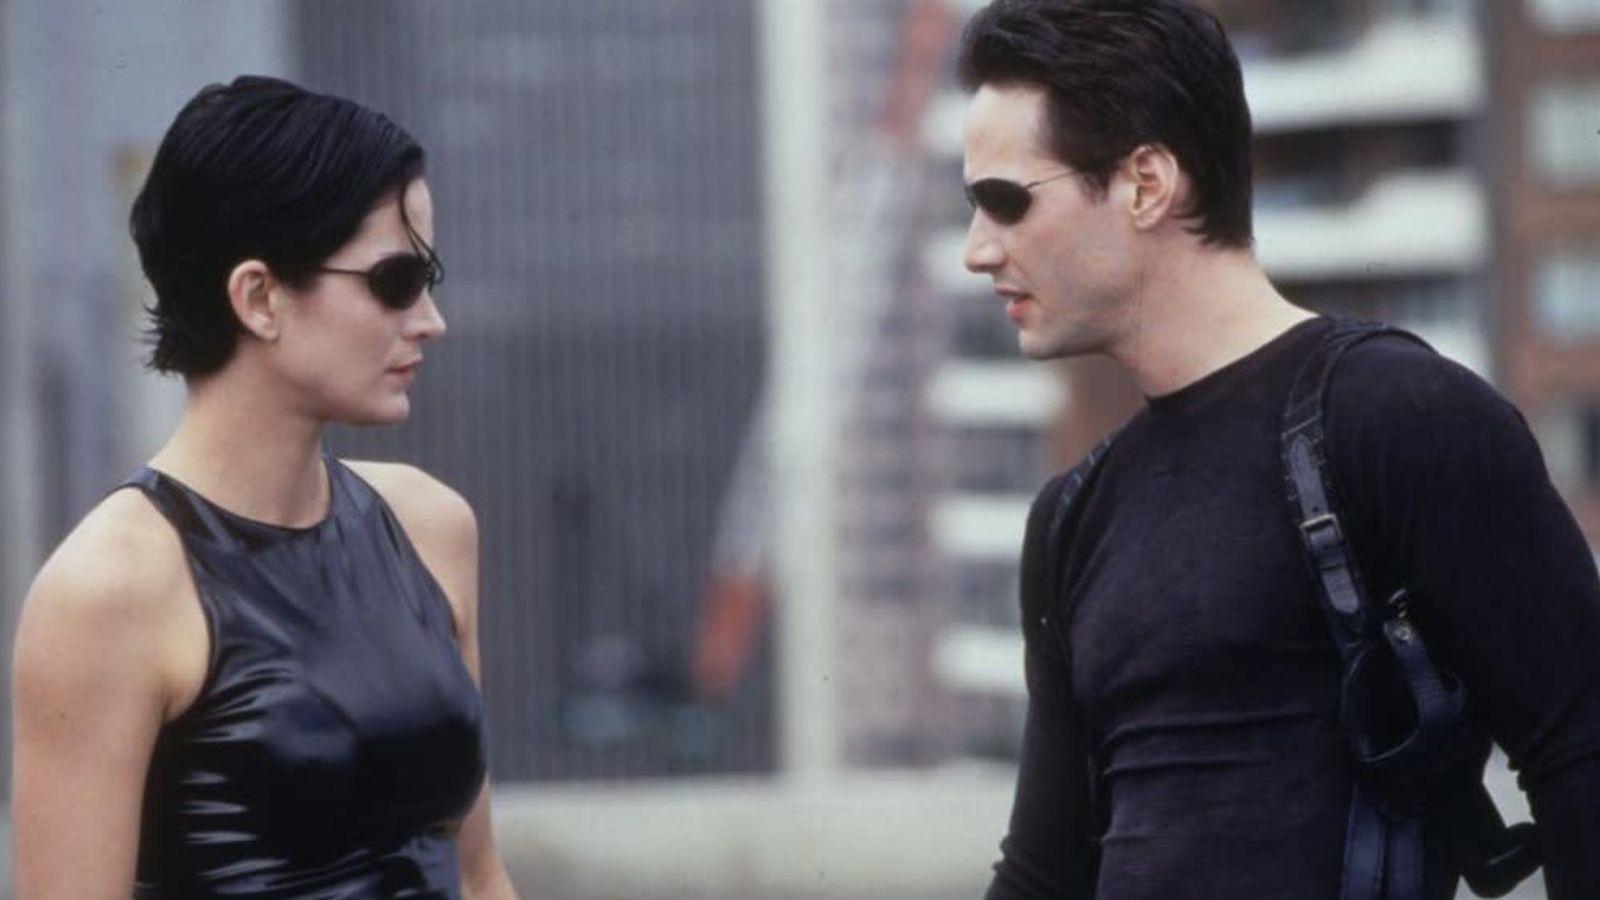 Matrix Keanu Reeves y Carrie-Anne Moss